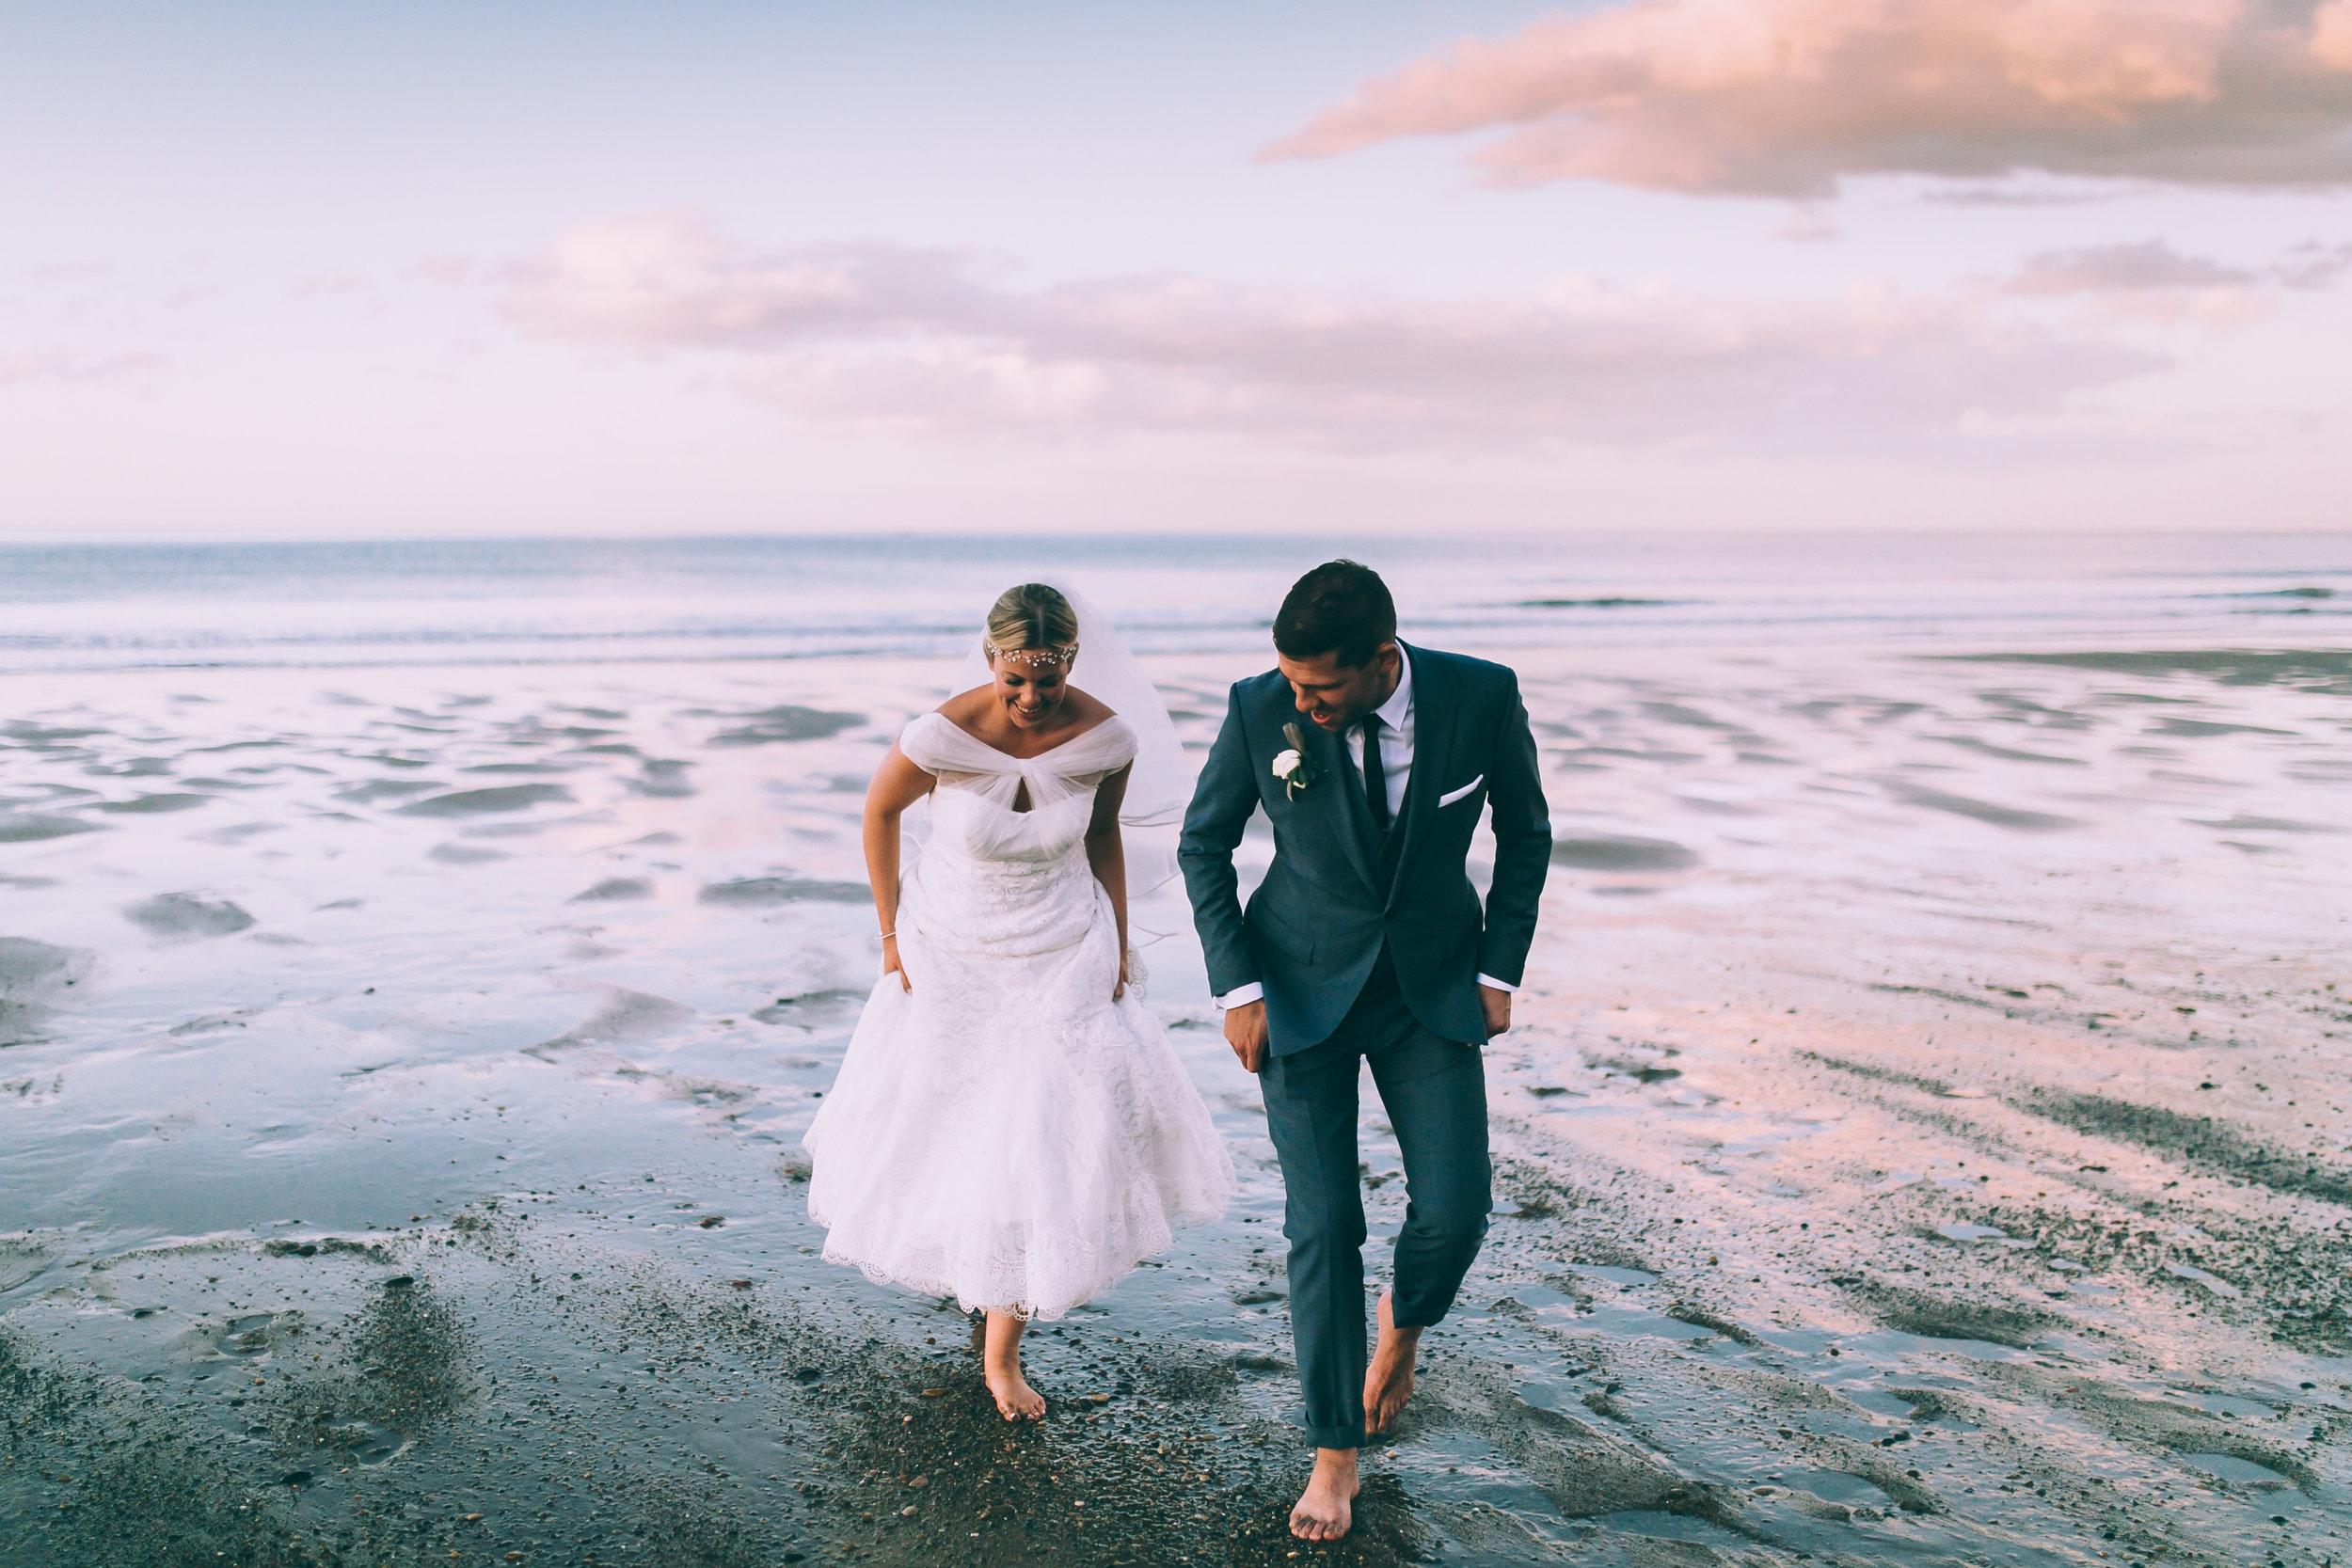 ClairandCraig_wedding_at_raithwaite_hall_tom_biddle_tb591.jpg